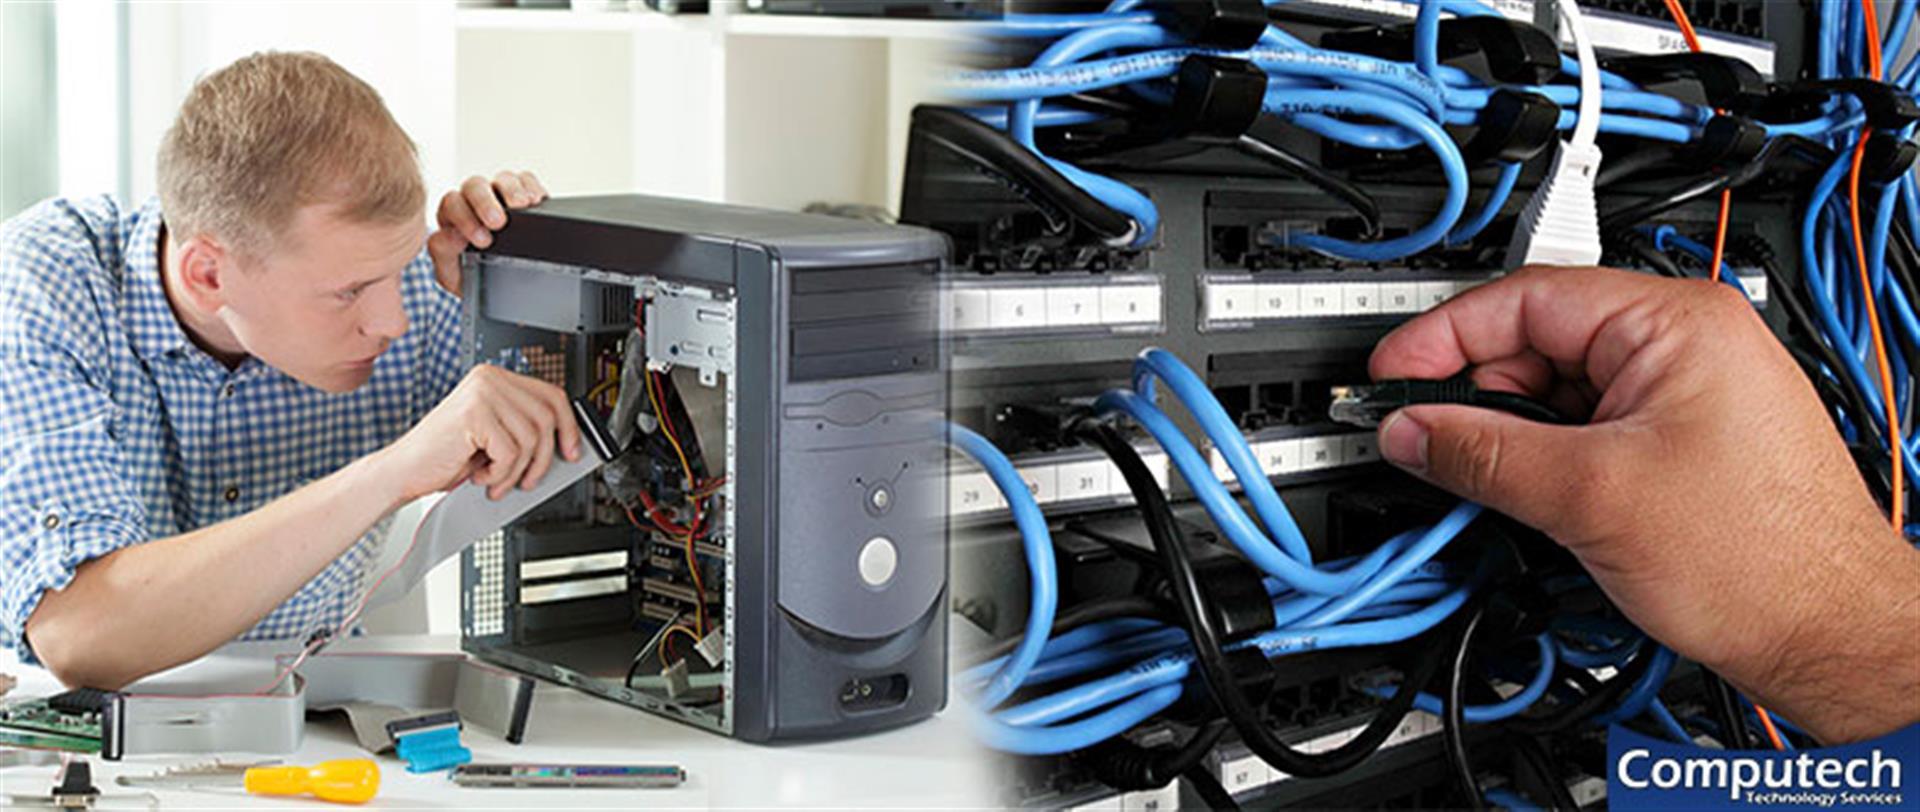 Bridgewater Virginia Onsite PC & Printer Repairs, Networks, Voice & Data Cabling Solutions